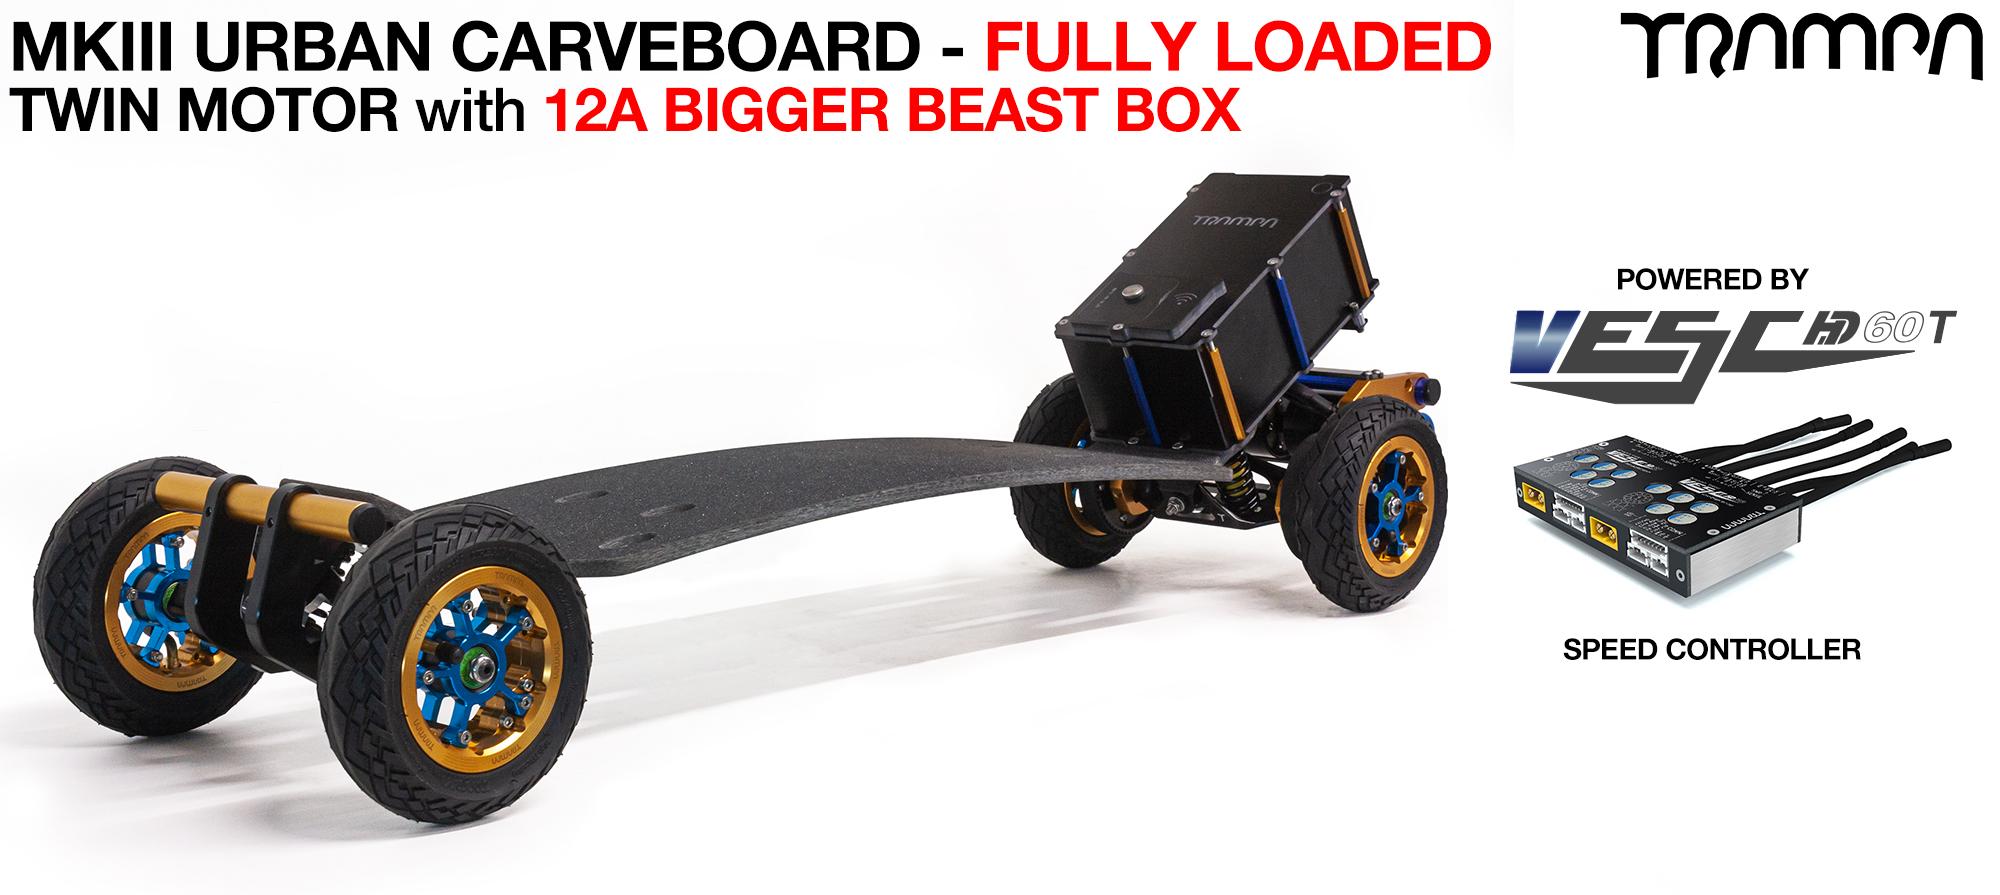 TRAMPA's MkIII Electric URBAN Carveboard - uses Mini Spring Trucks with MkIII Carve board Motor Mounts Custom TRAMPA hubs & 125mm URBAN longboard Tyres - TWIN Motor FULLY LOADED